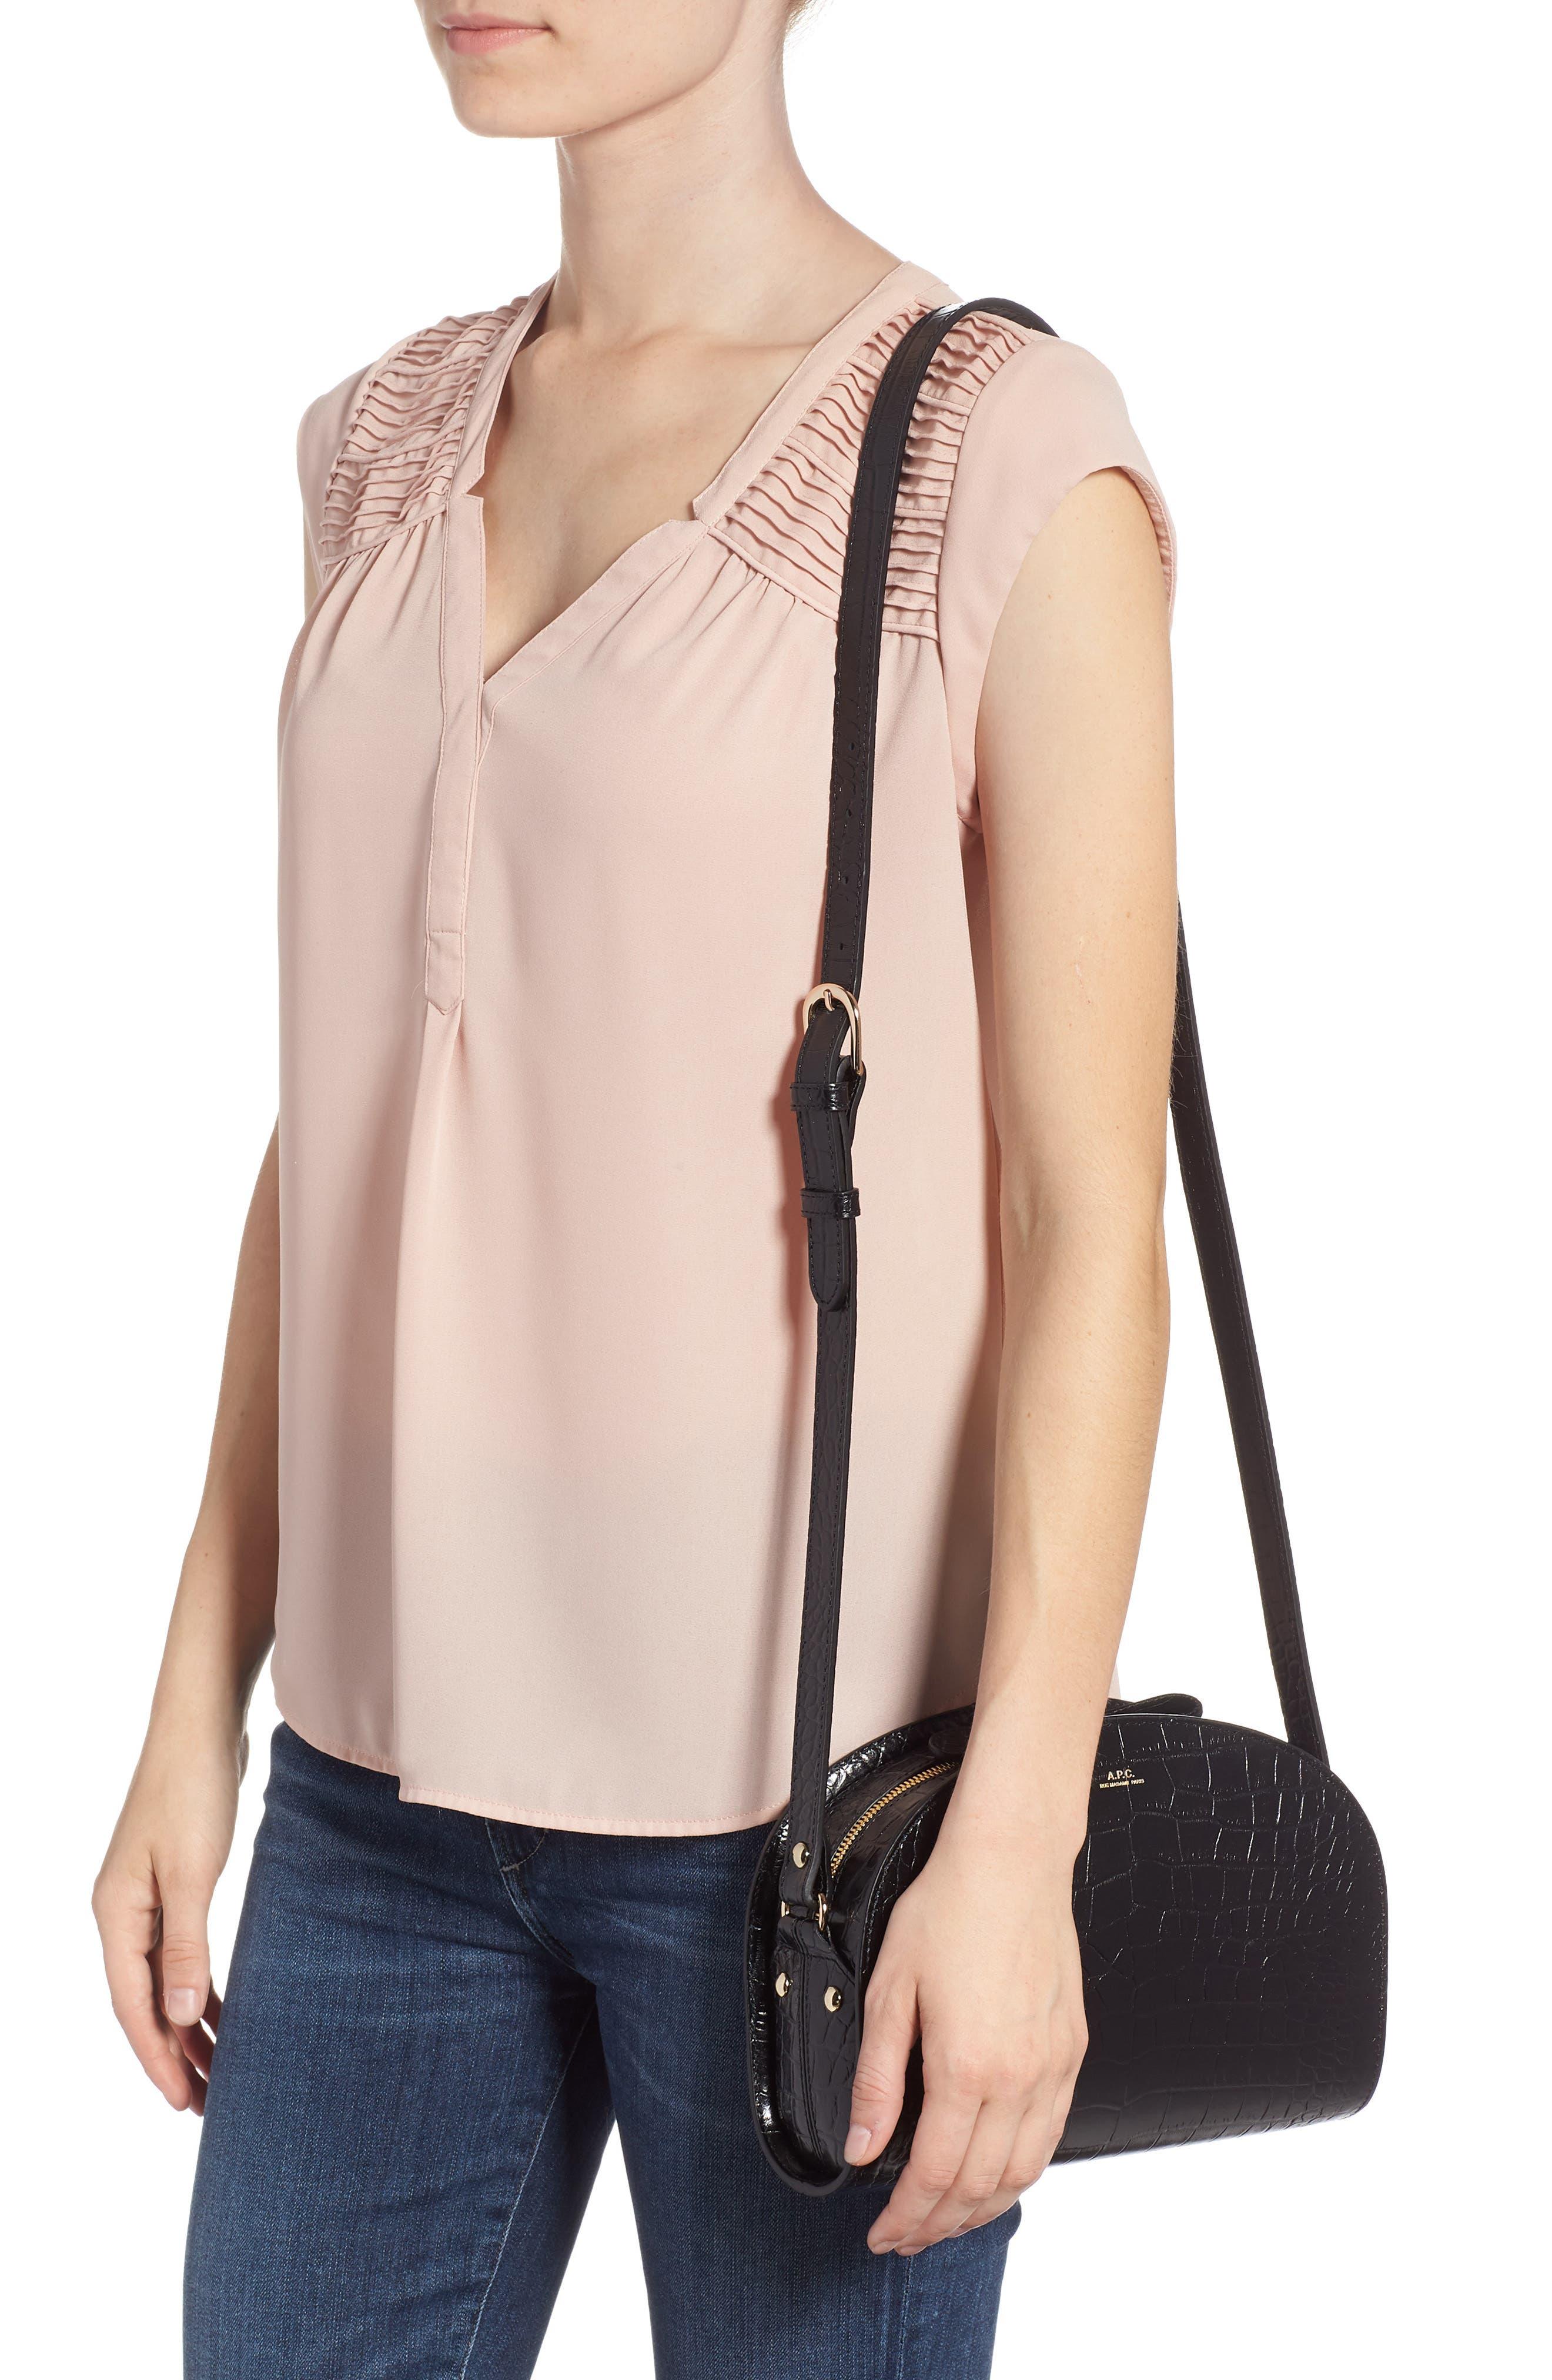 Sac Demi Lune Leather Shoulder Bag,                             Alternate thumbnail 2, color,                             001